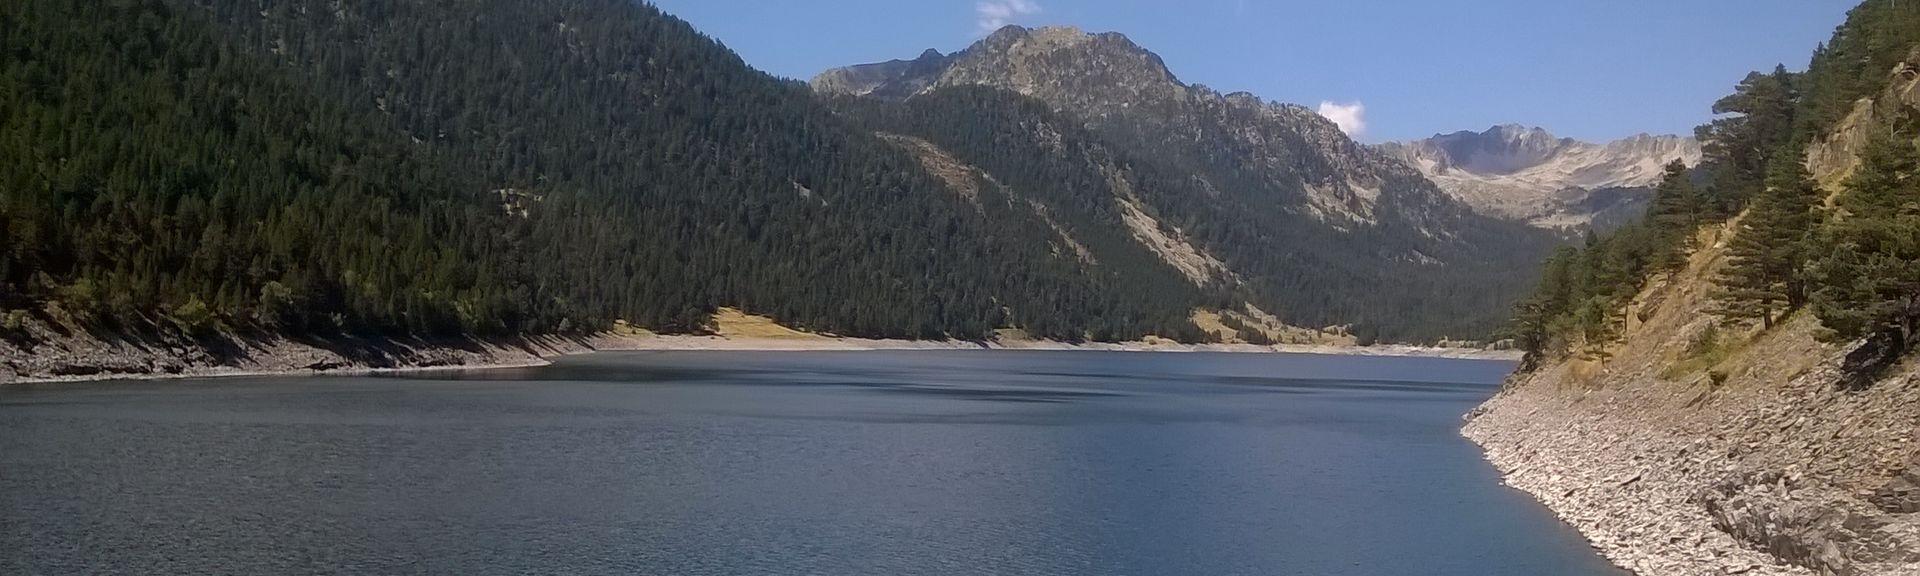 Col de Peyresourde, Loudervielle, Occitania, Francia